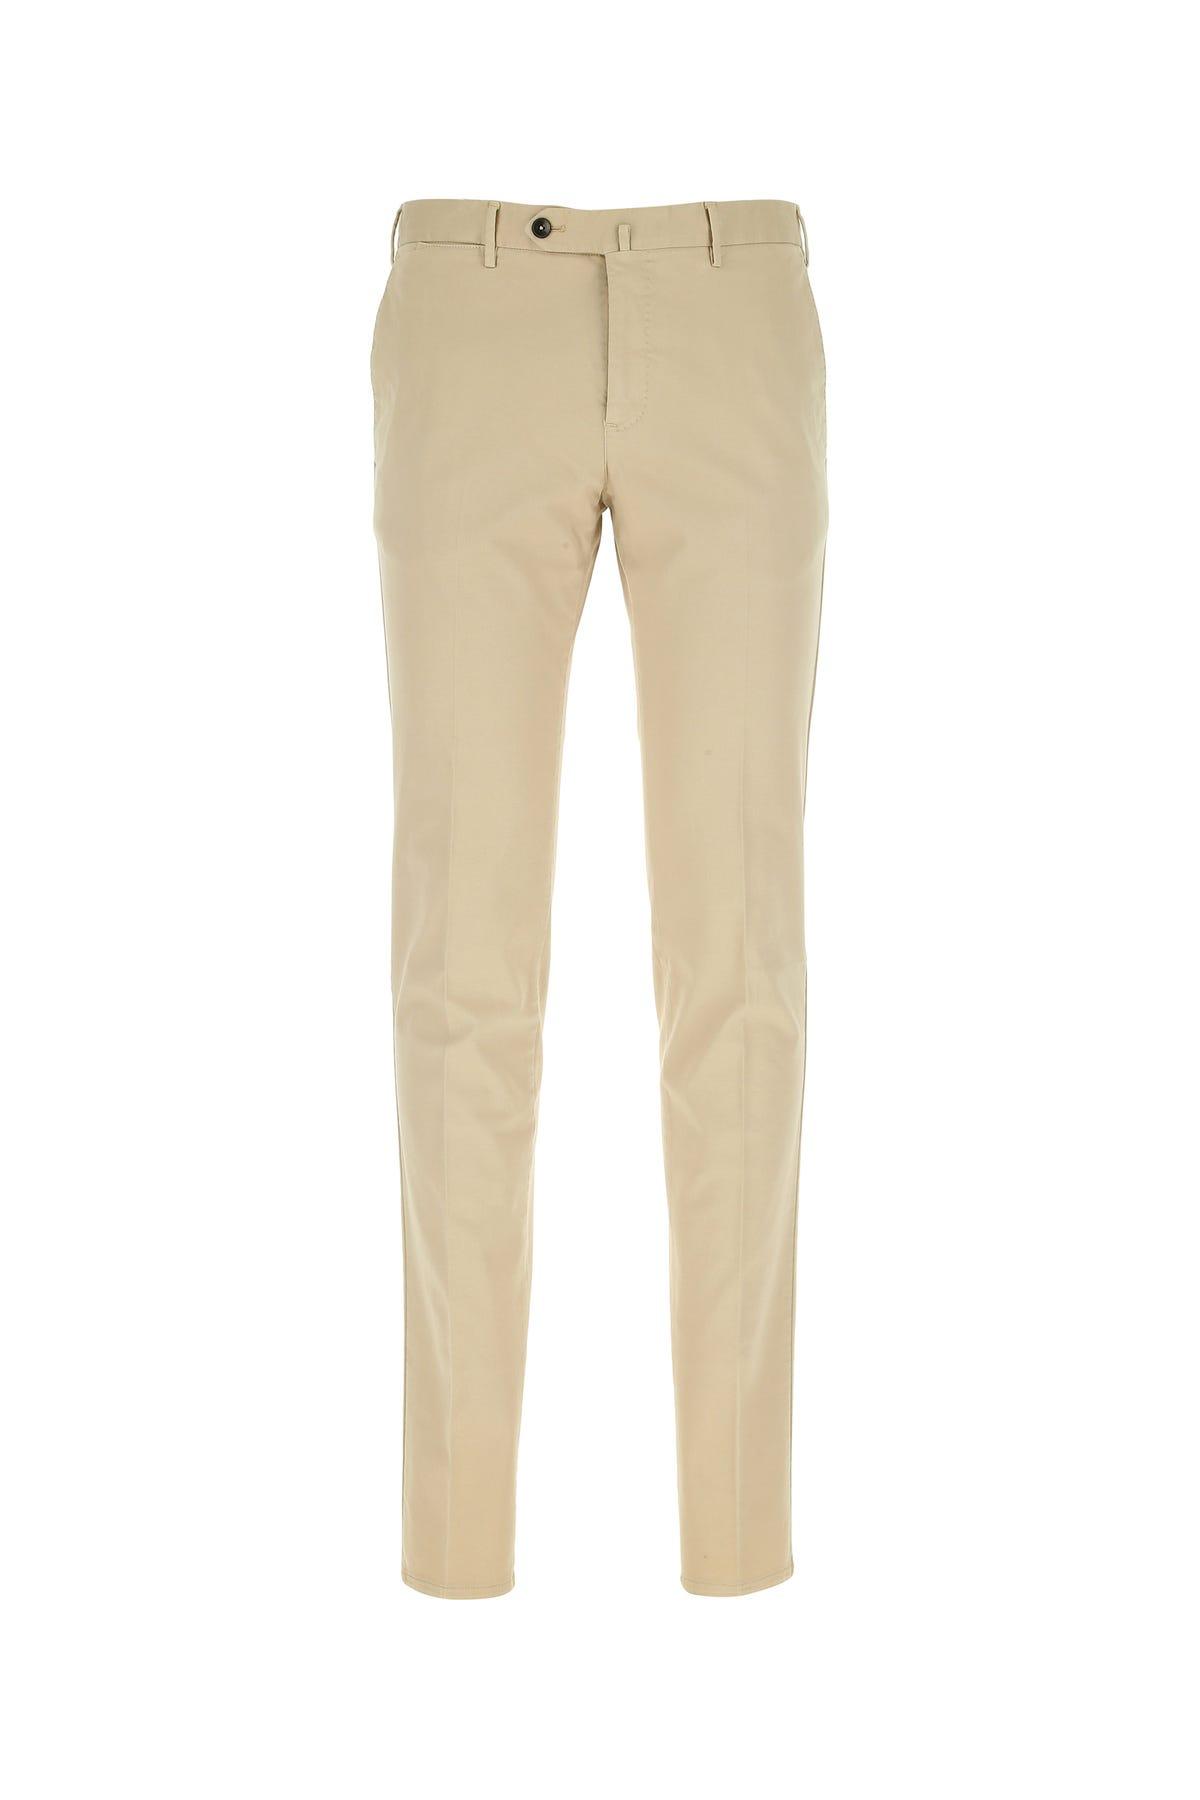 Pt01 Sand Stretch Cotton Blend Pant  Beige  Uomo 56